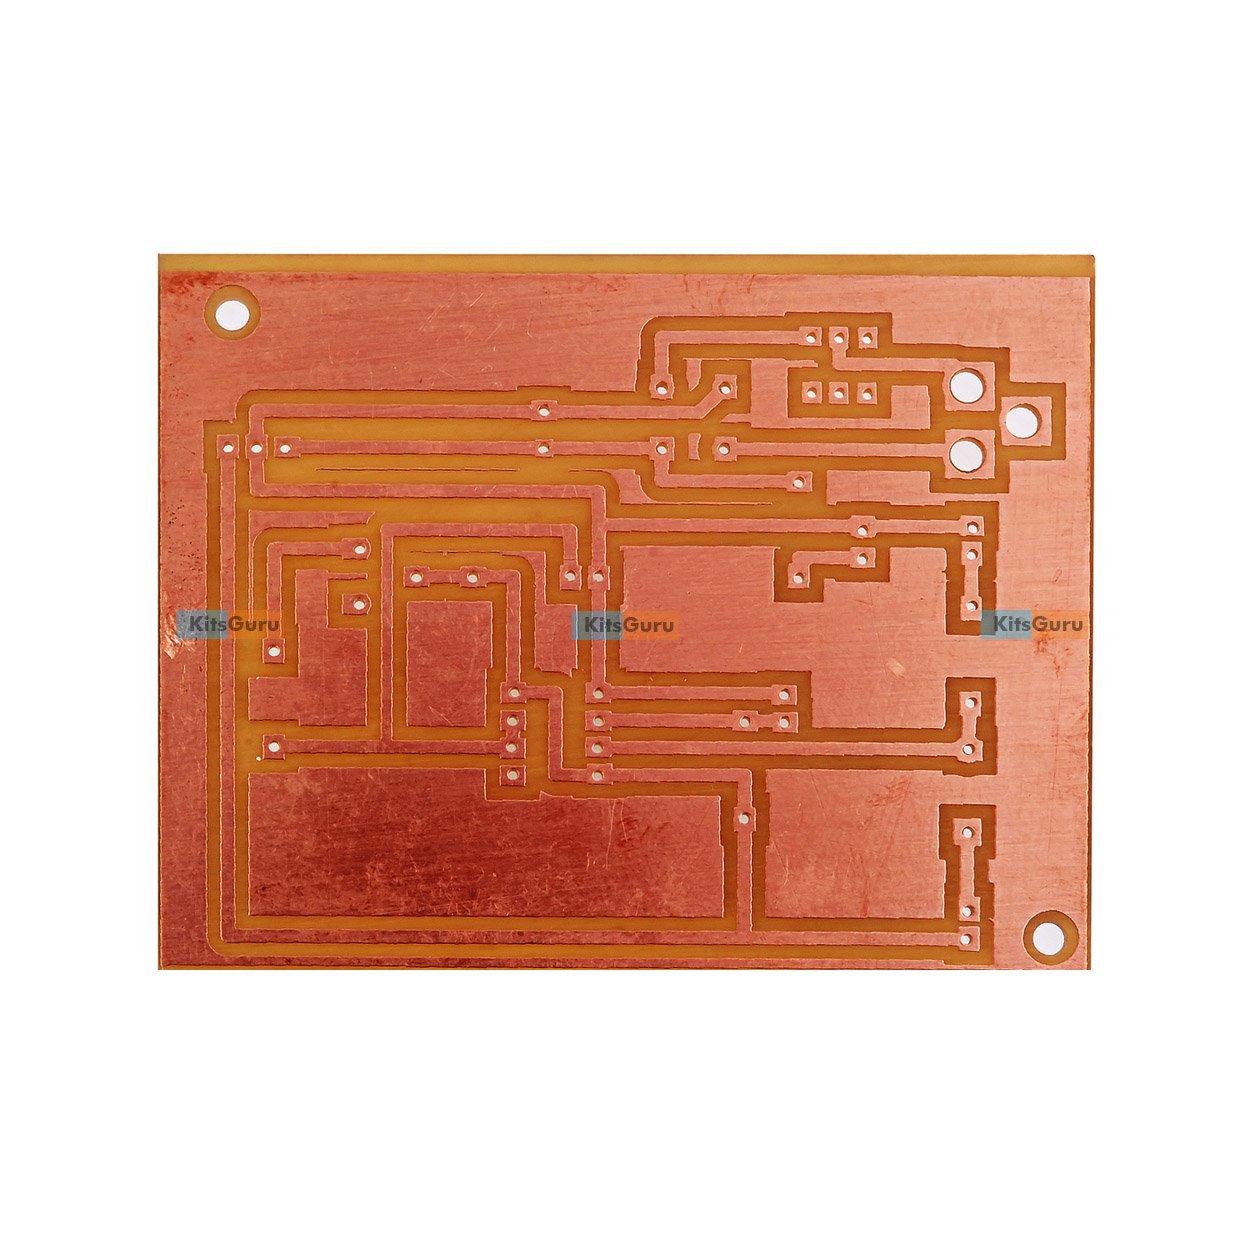 Diy Kit Adjustable 1 10 Minute Timer Circuit Lgkt073 Digital Periodic Timing Electronic Tutorial Circuits